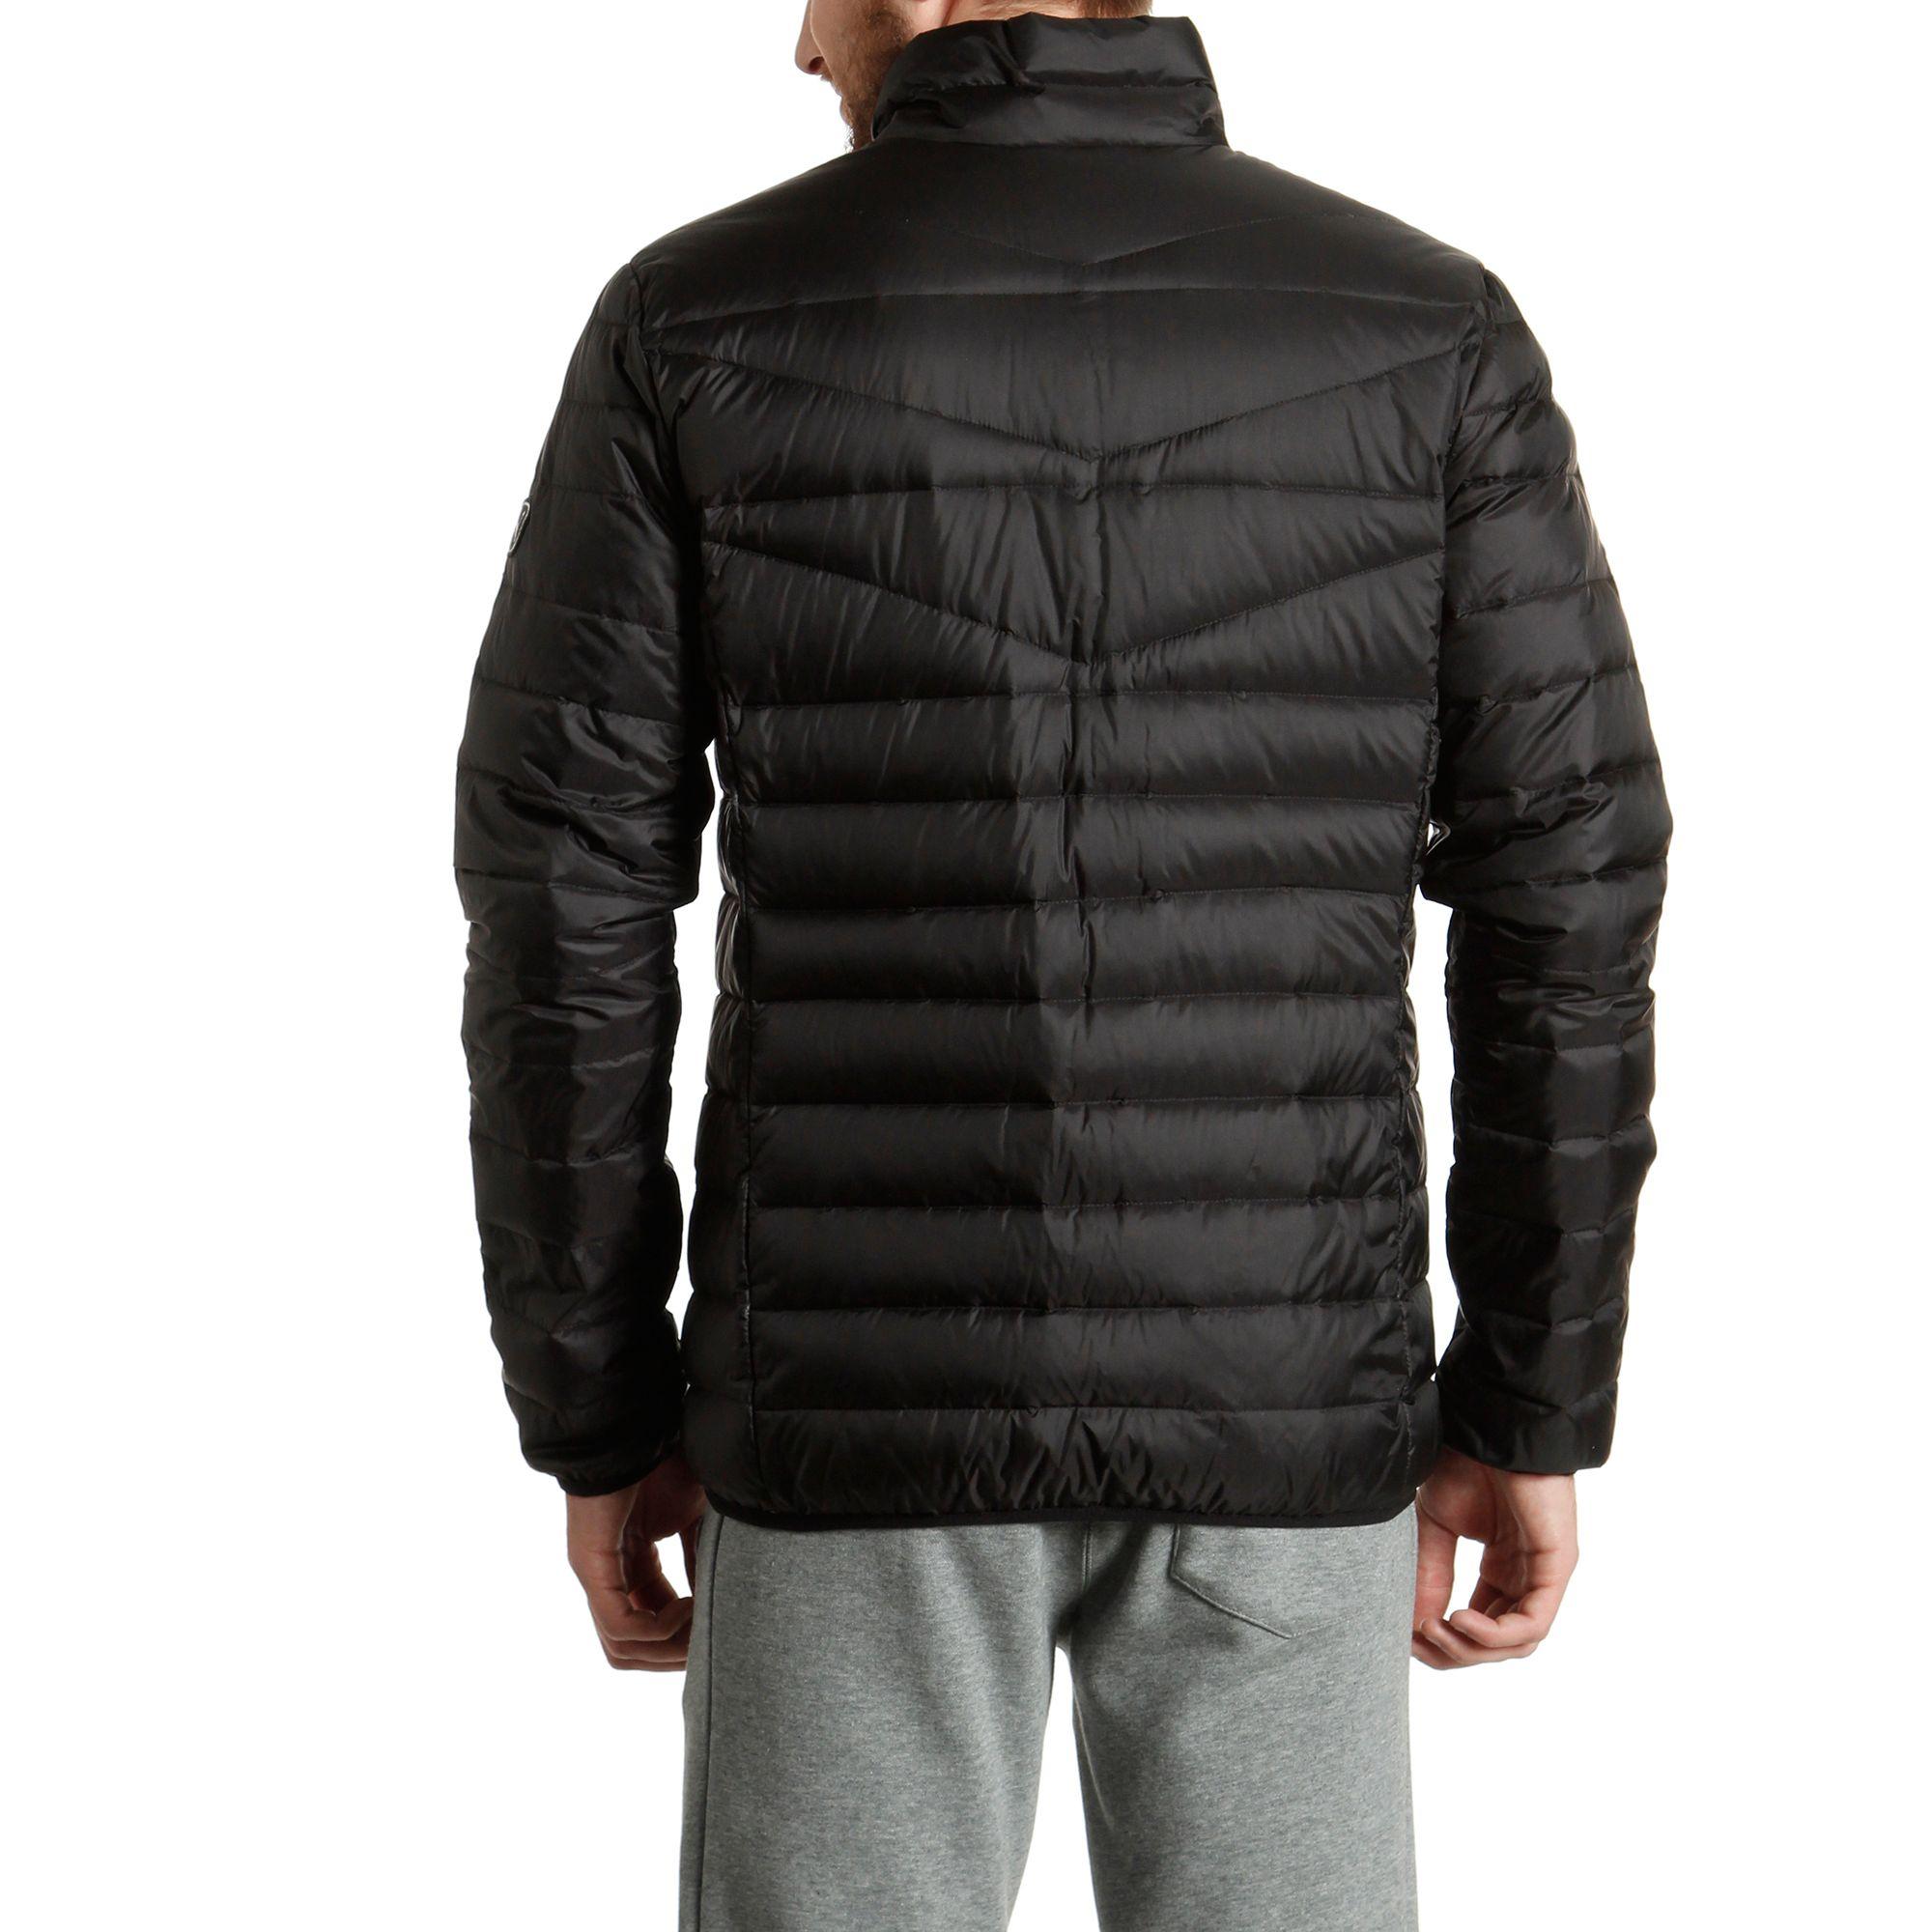 PUMA Lightweight Padded Down Jacket Apparel Winter Jackets Basics ...